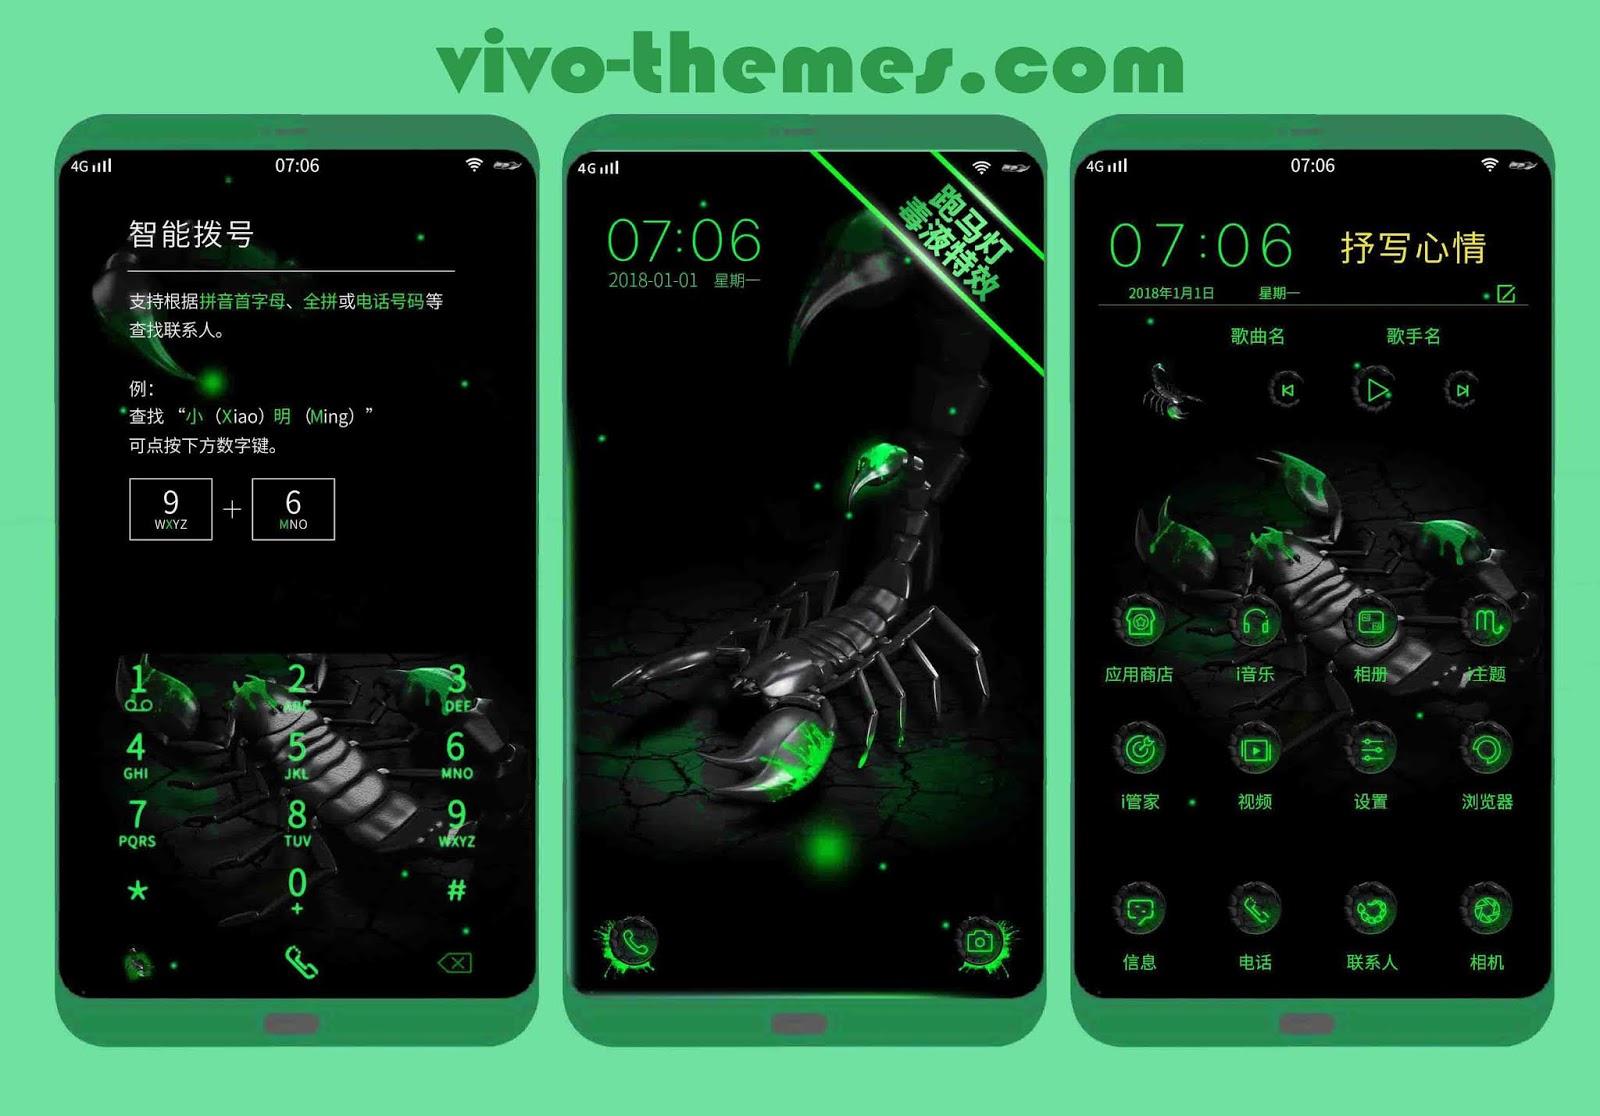 √ Green Scorpion Theme For Android Vivo Phones - vivo